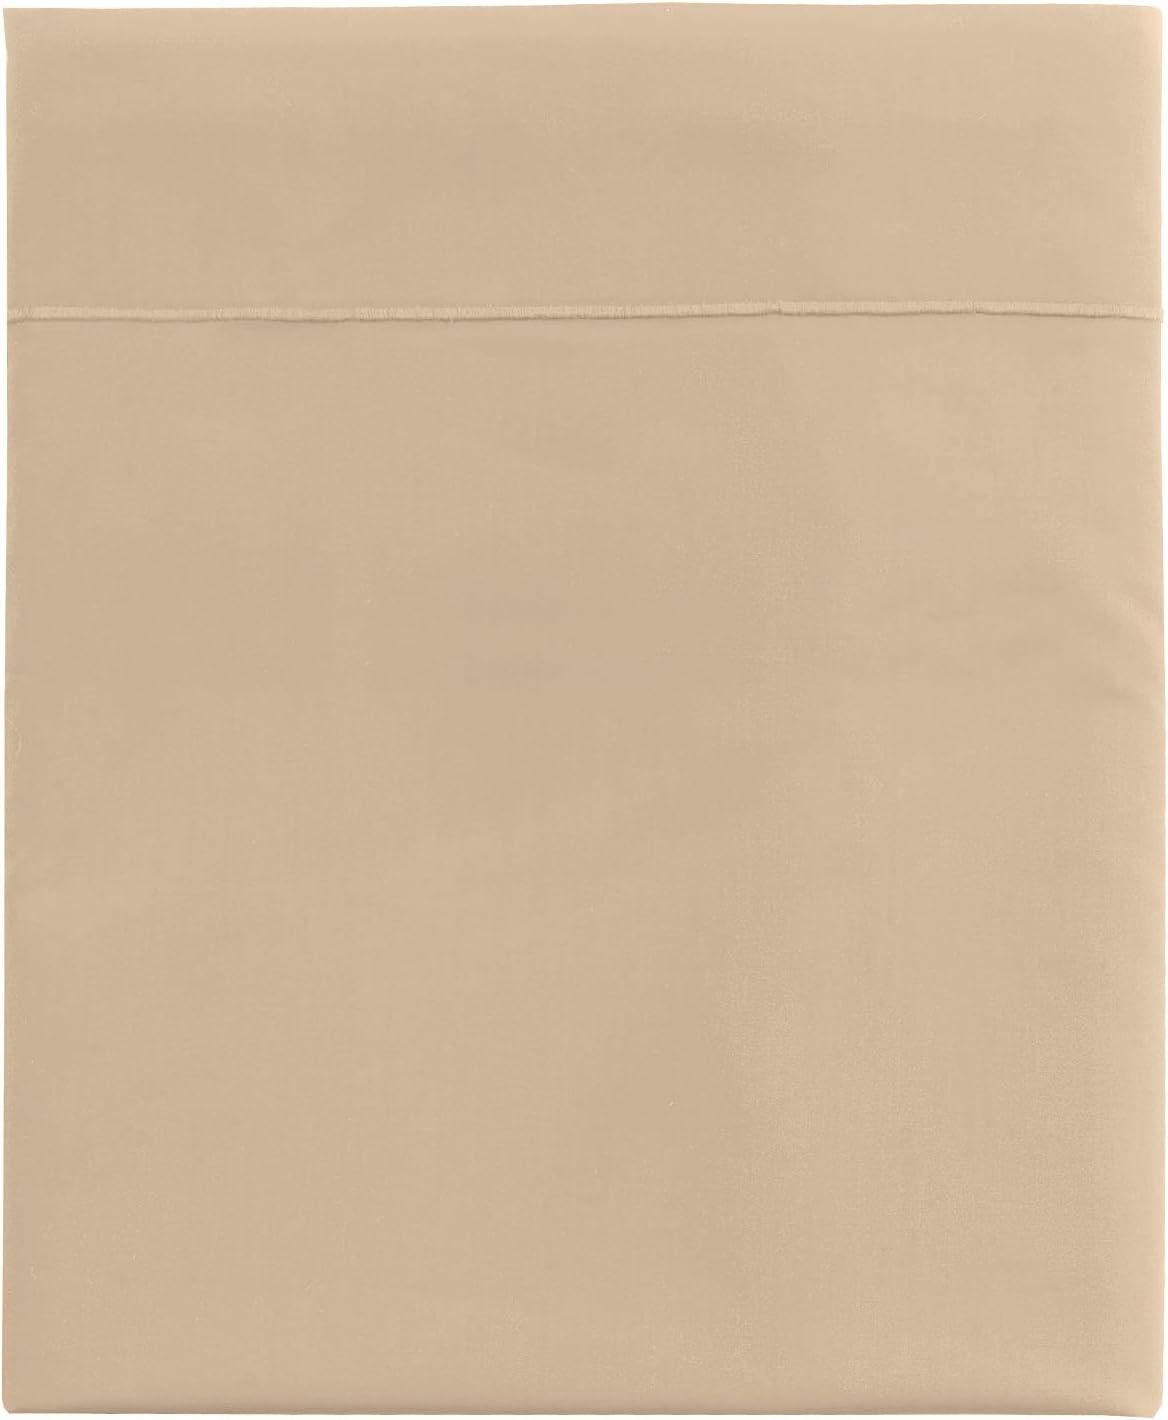 Essix Drap Plat Star Line Coton Blanc 270 x 300 cm